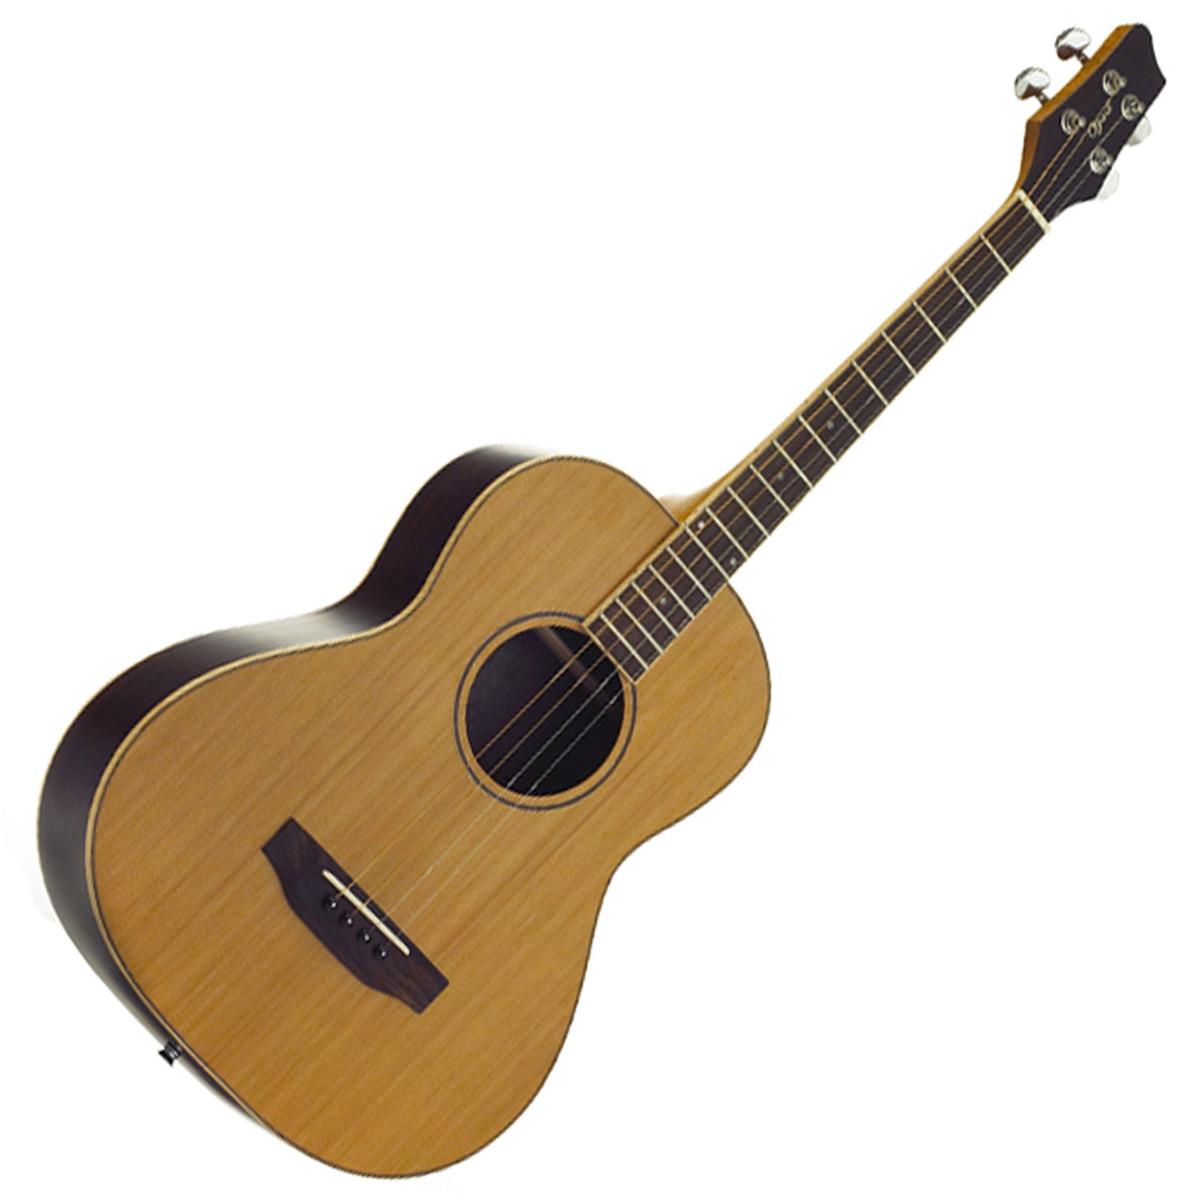 ozark tenor guitar at gear4music. Black Bedroom Furniture Sets. Home Design Ideas